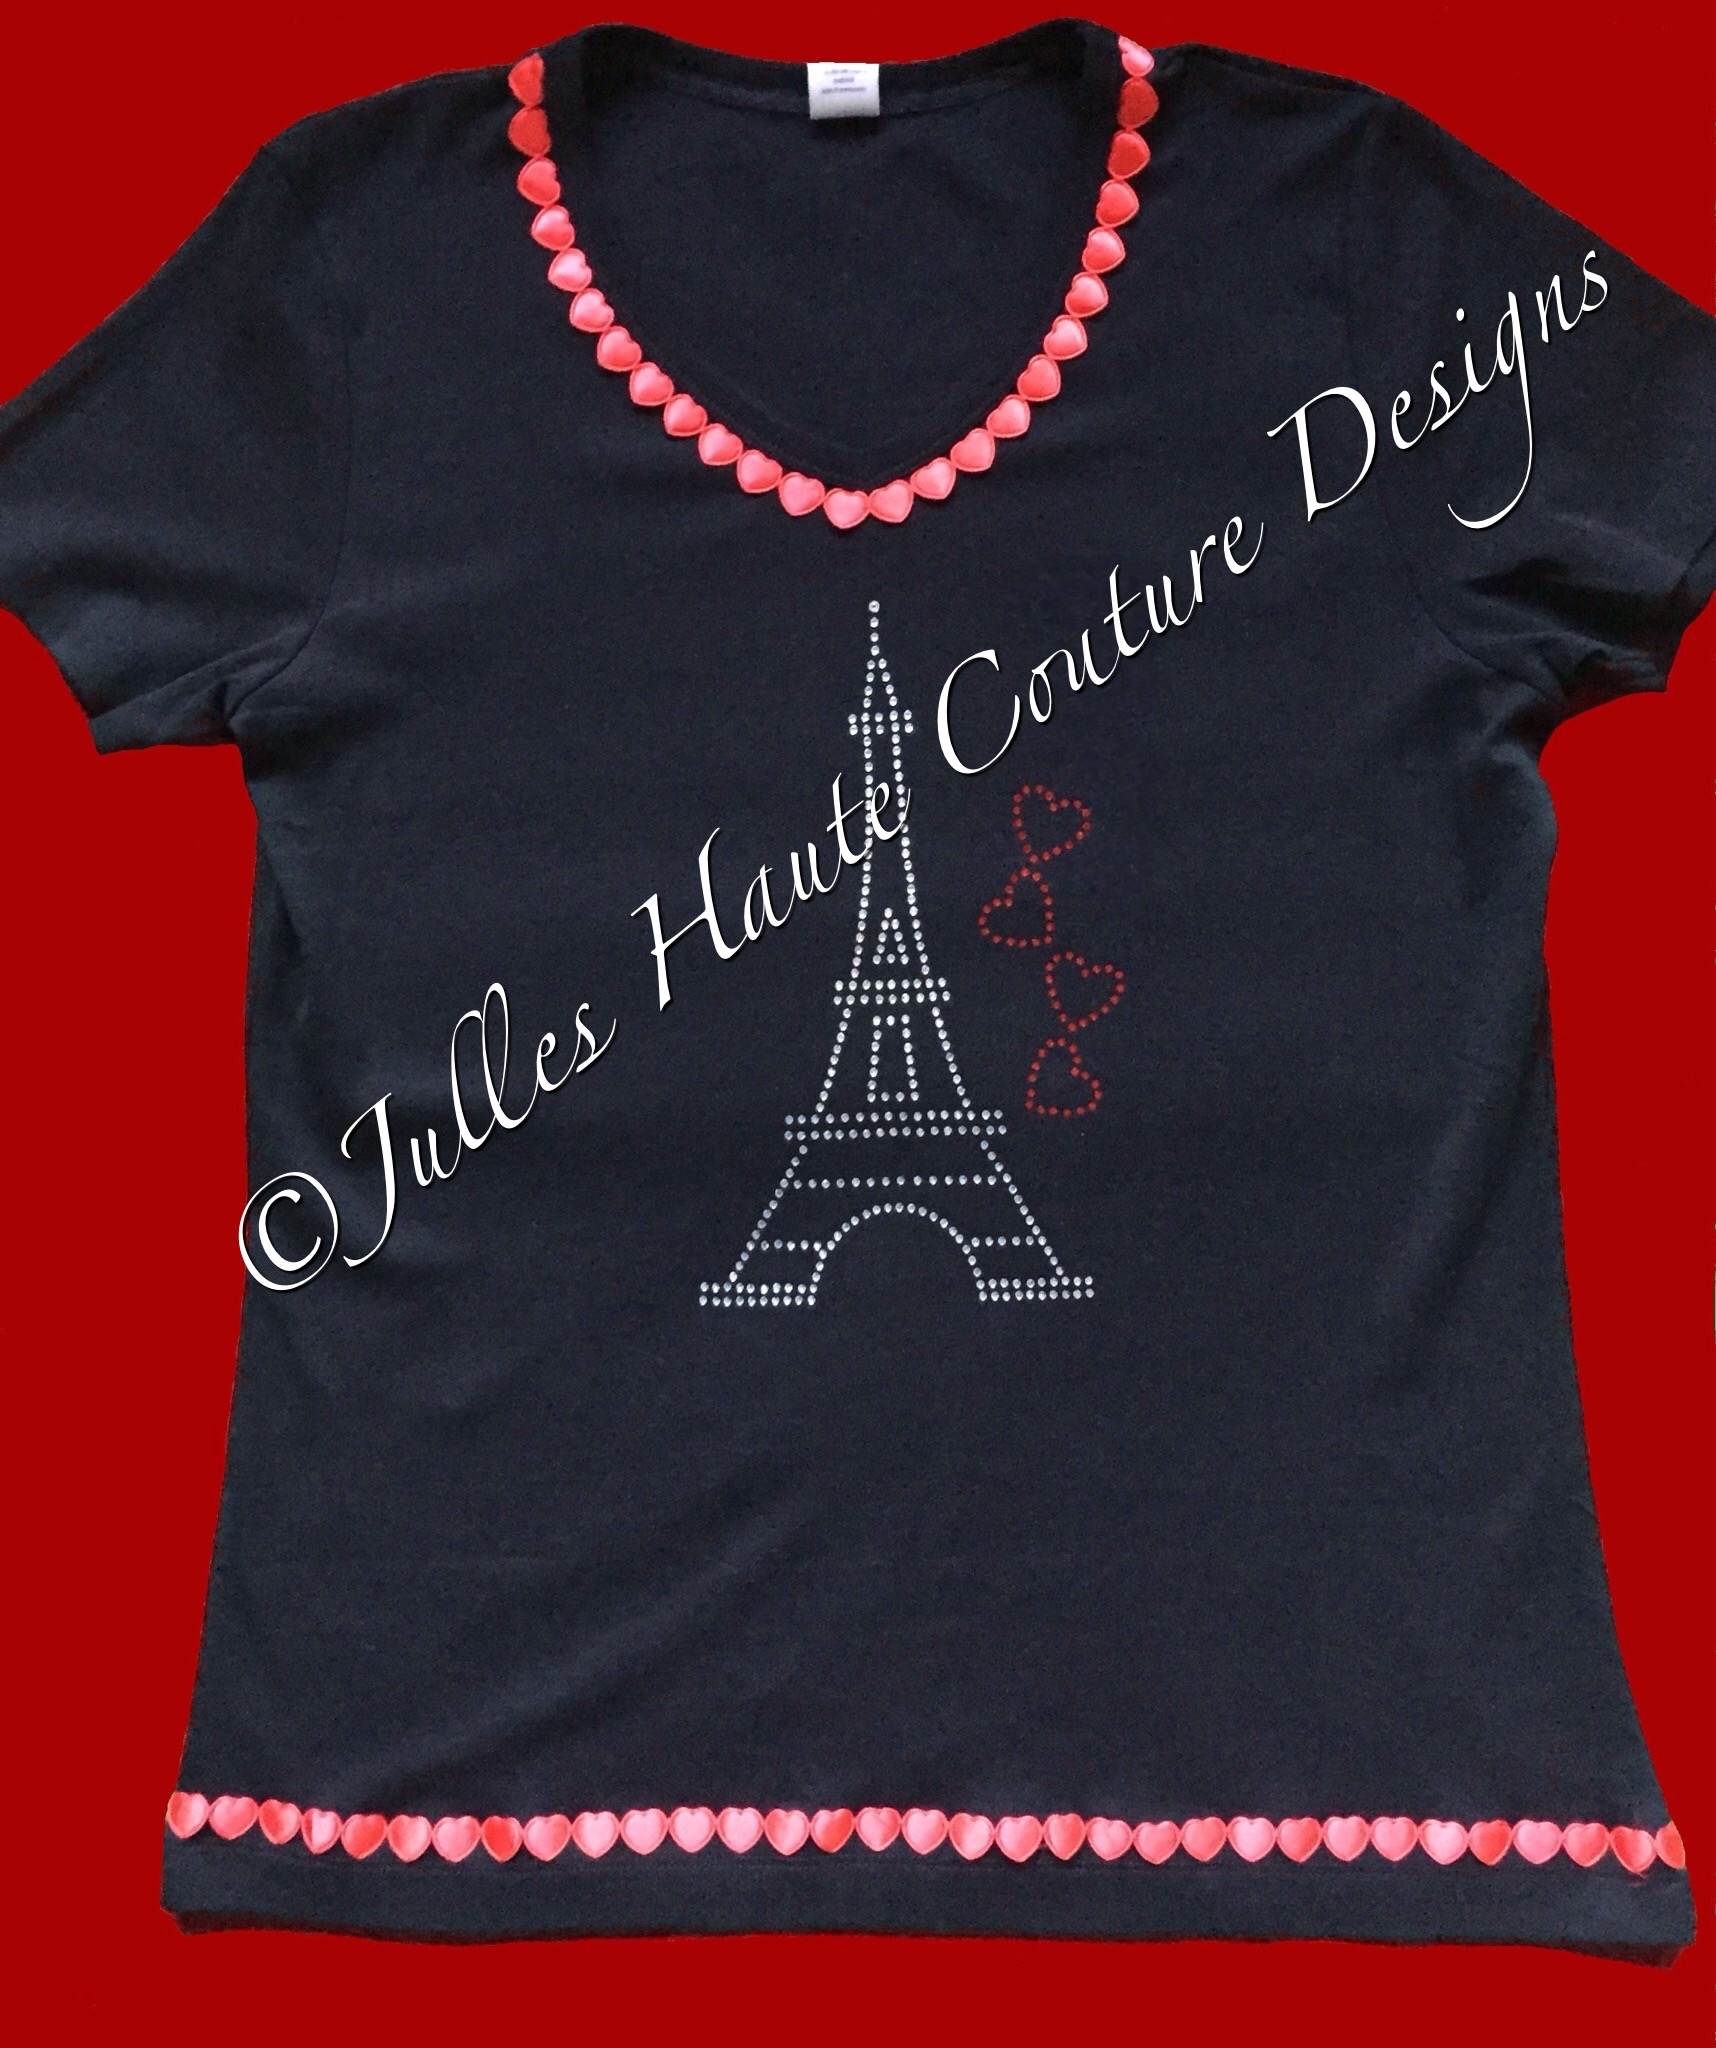 eiffel-tower-t-shirt.jpg